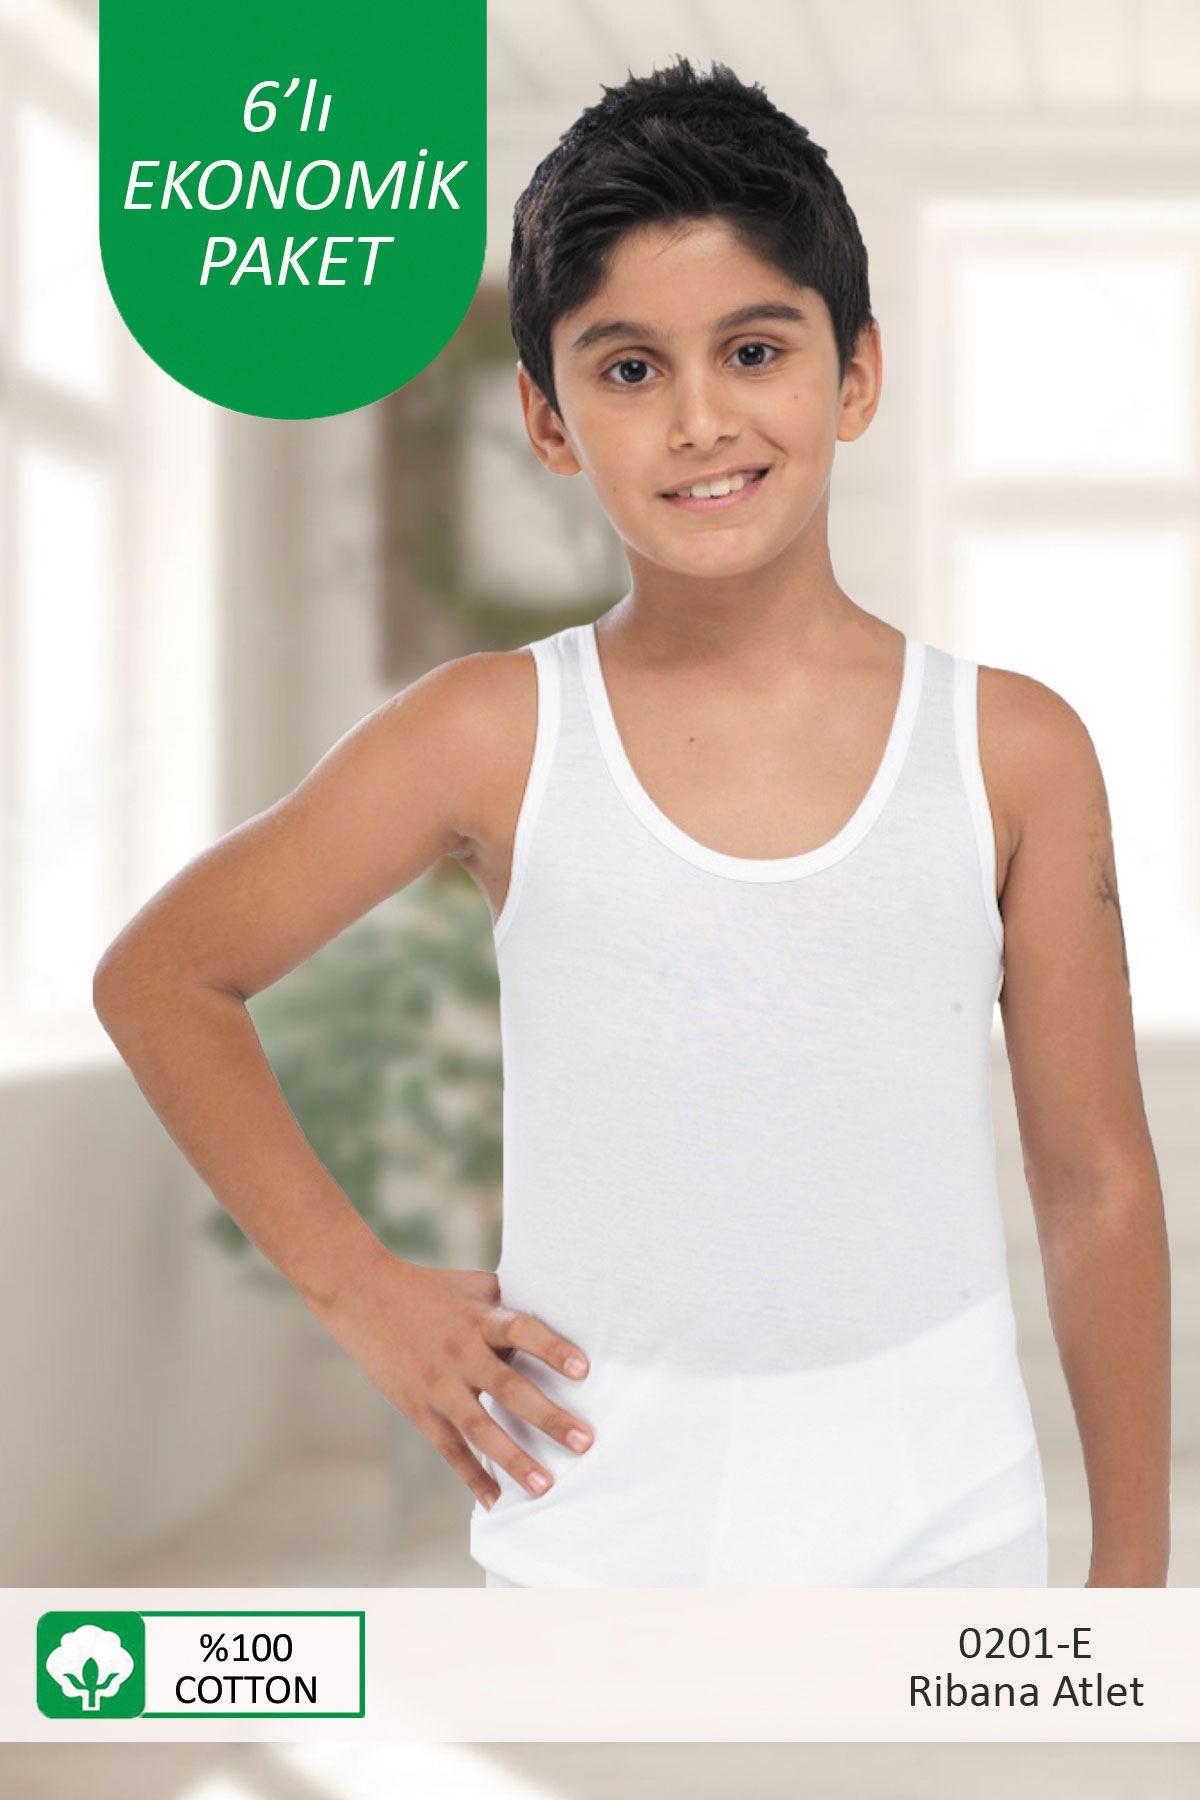 Beyaz Erkek Çocuk 6 ' Lı Ekonomik Paket E-Serisi Ribana Pamuklu Atlet 201-E